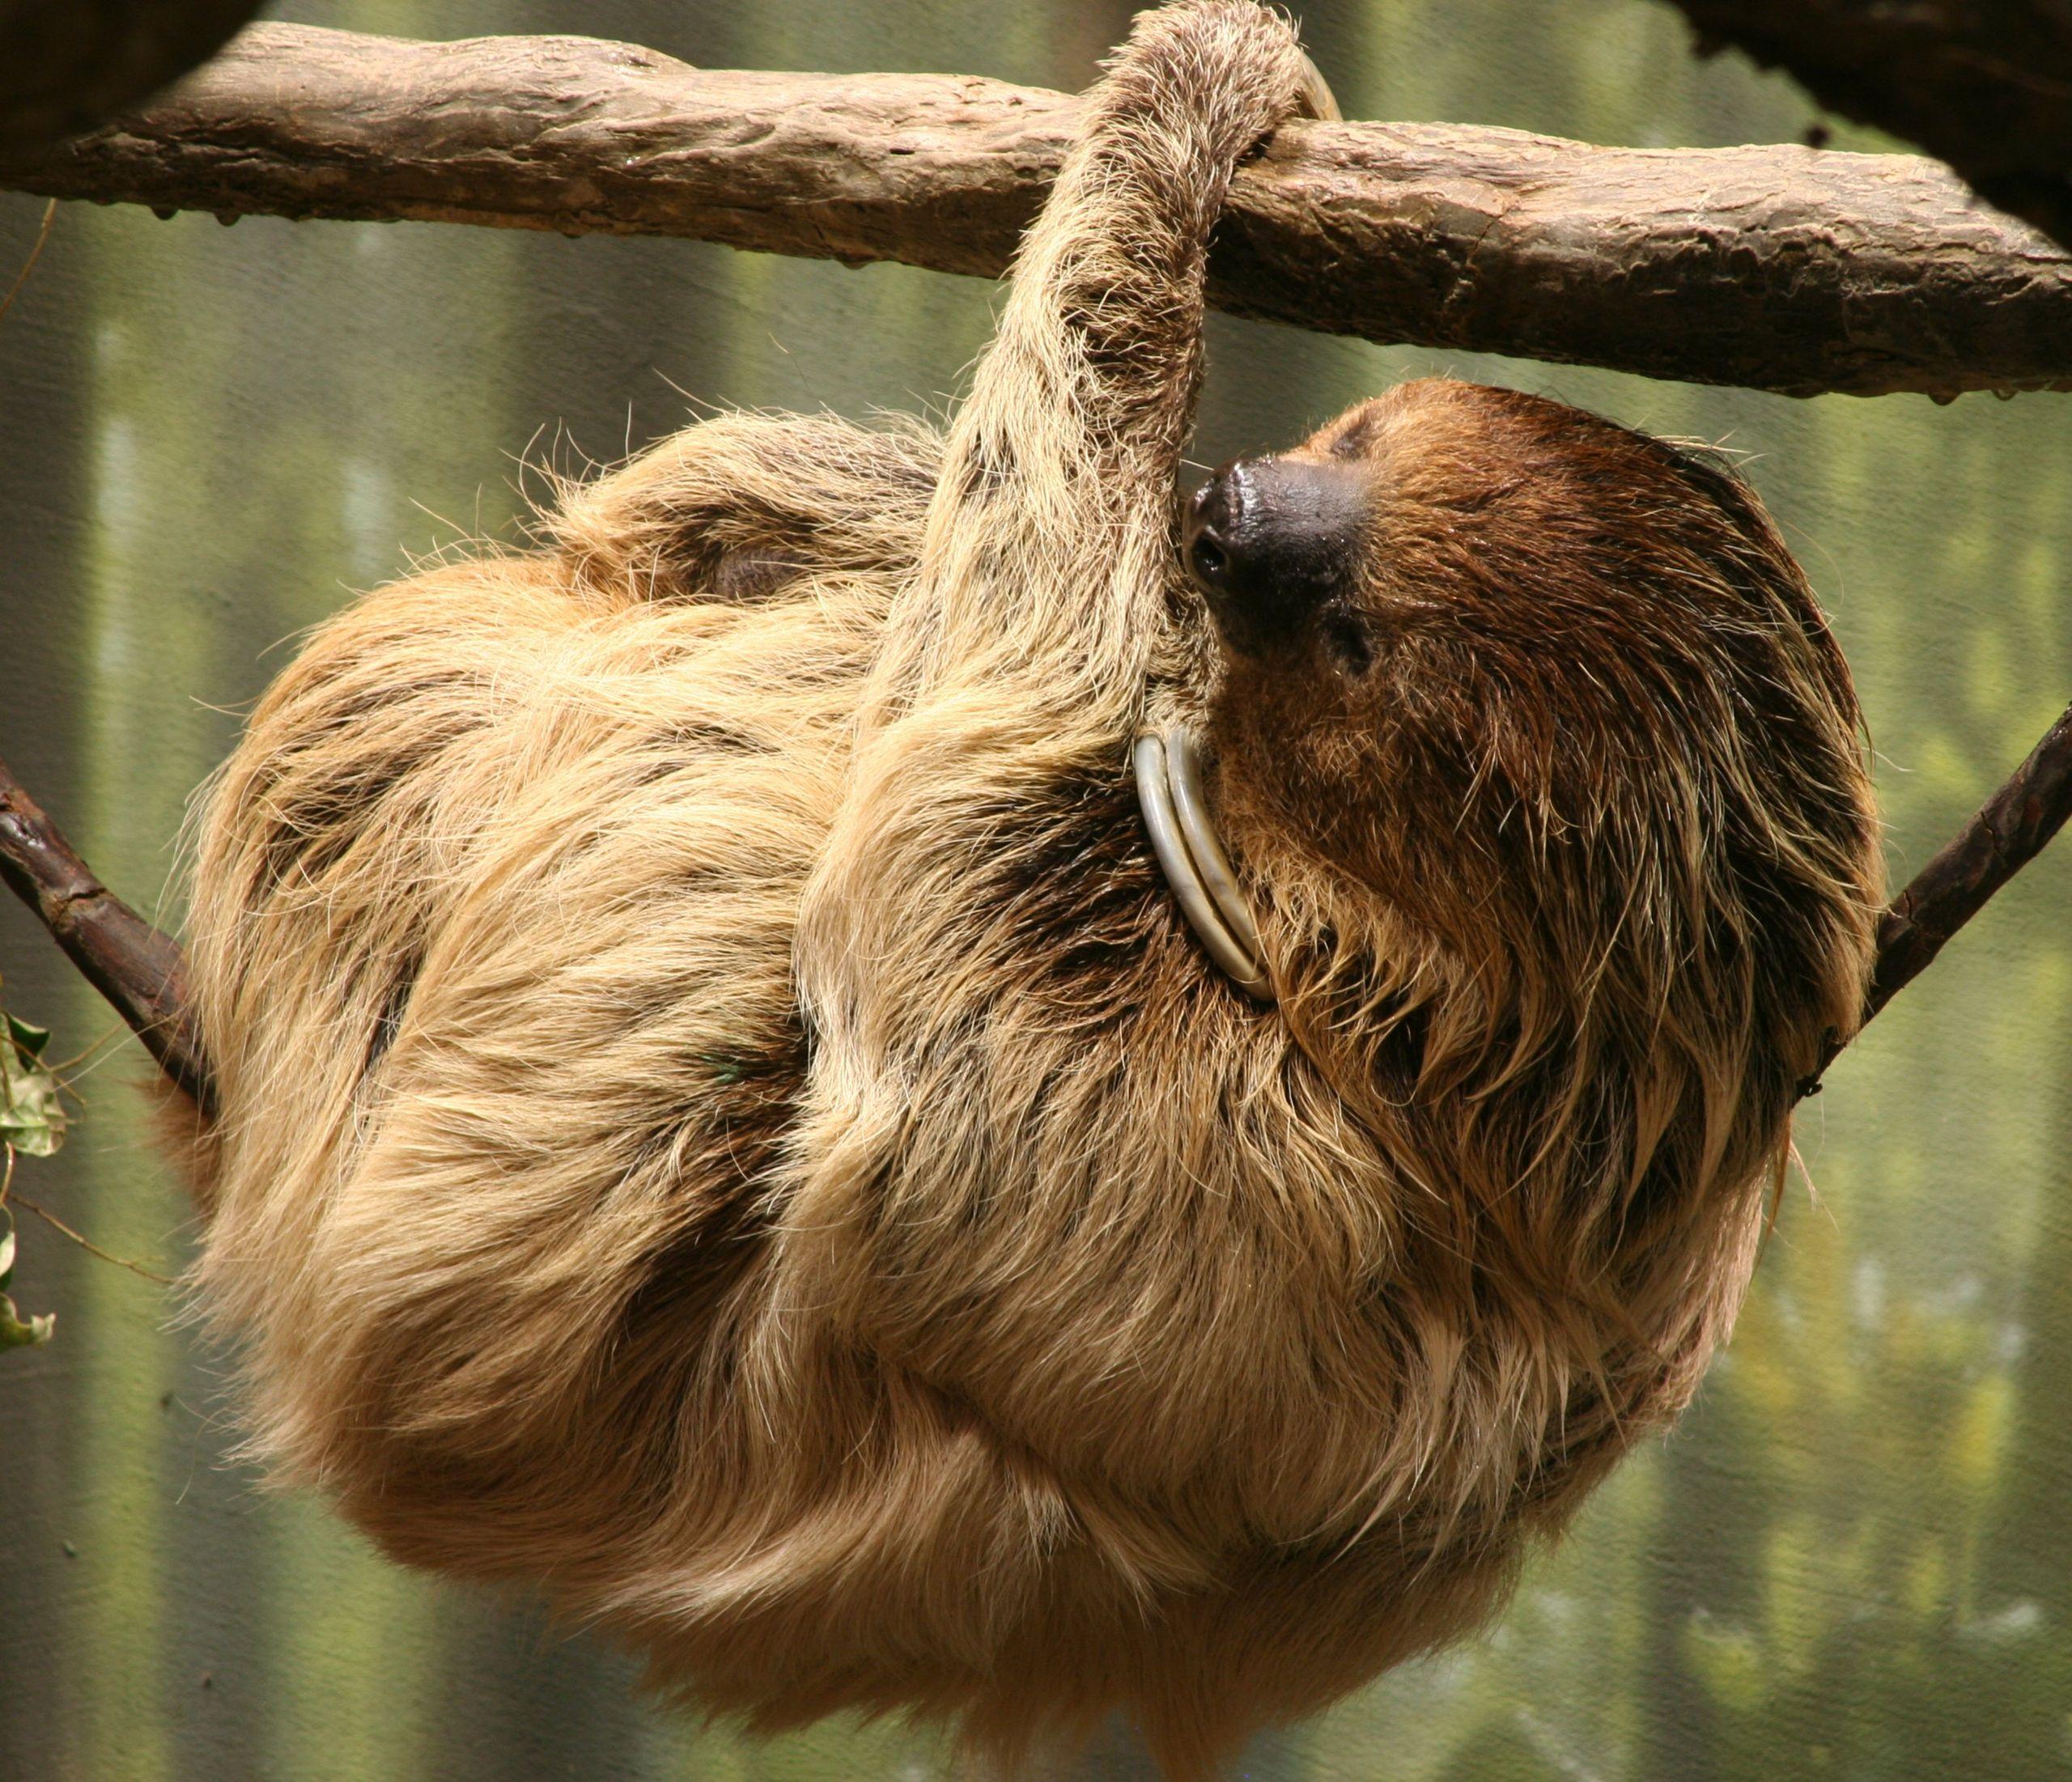 10.Choloepus_didactylus_2_-_Buffalo_Zoo